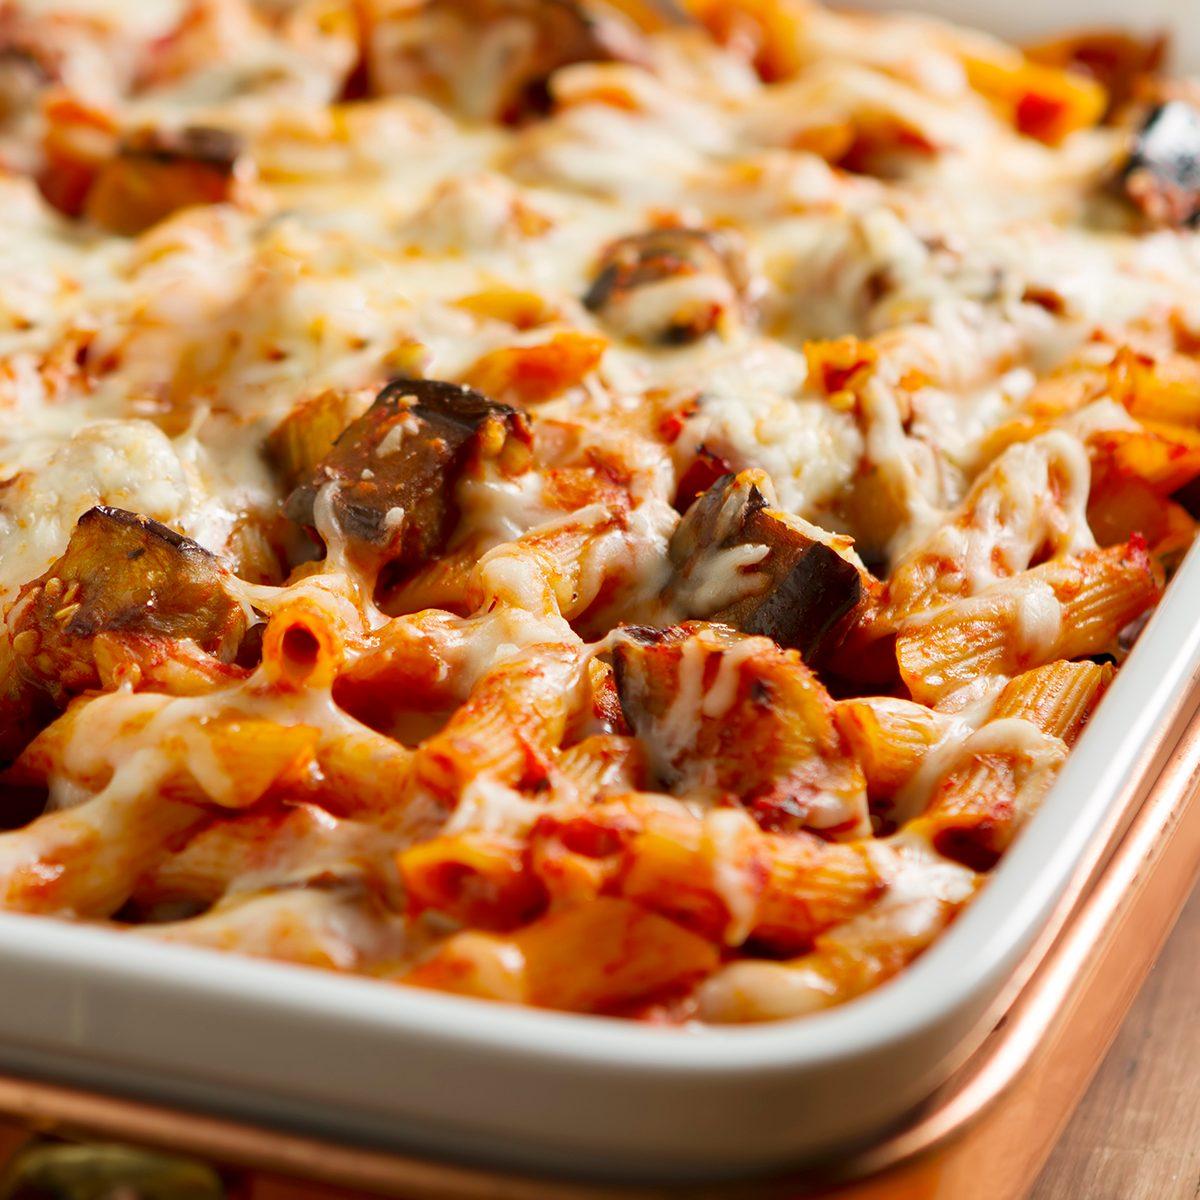 The classic Sicilian dish made with rigatoni pasta, fresh eggplant, onion, basil, olive oil, and mozzarella cheese.